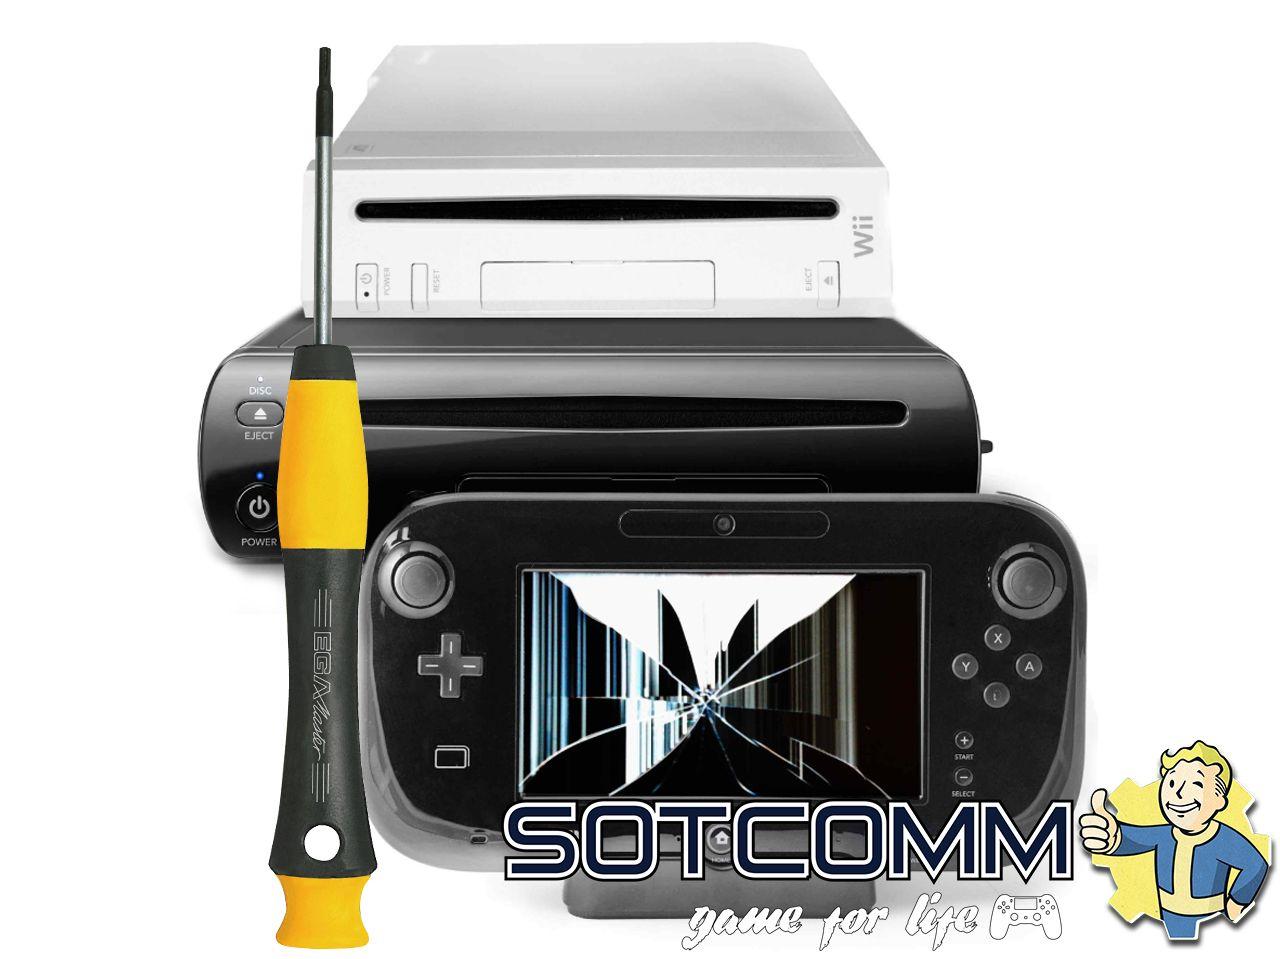 Ремонт Wii и Wii U